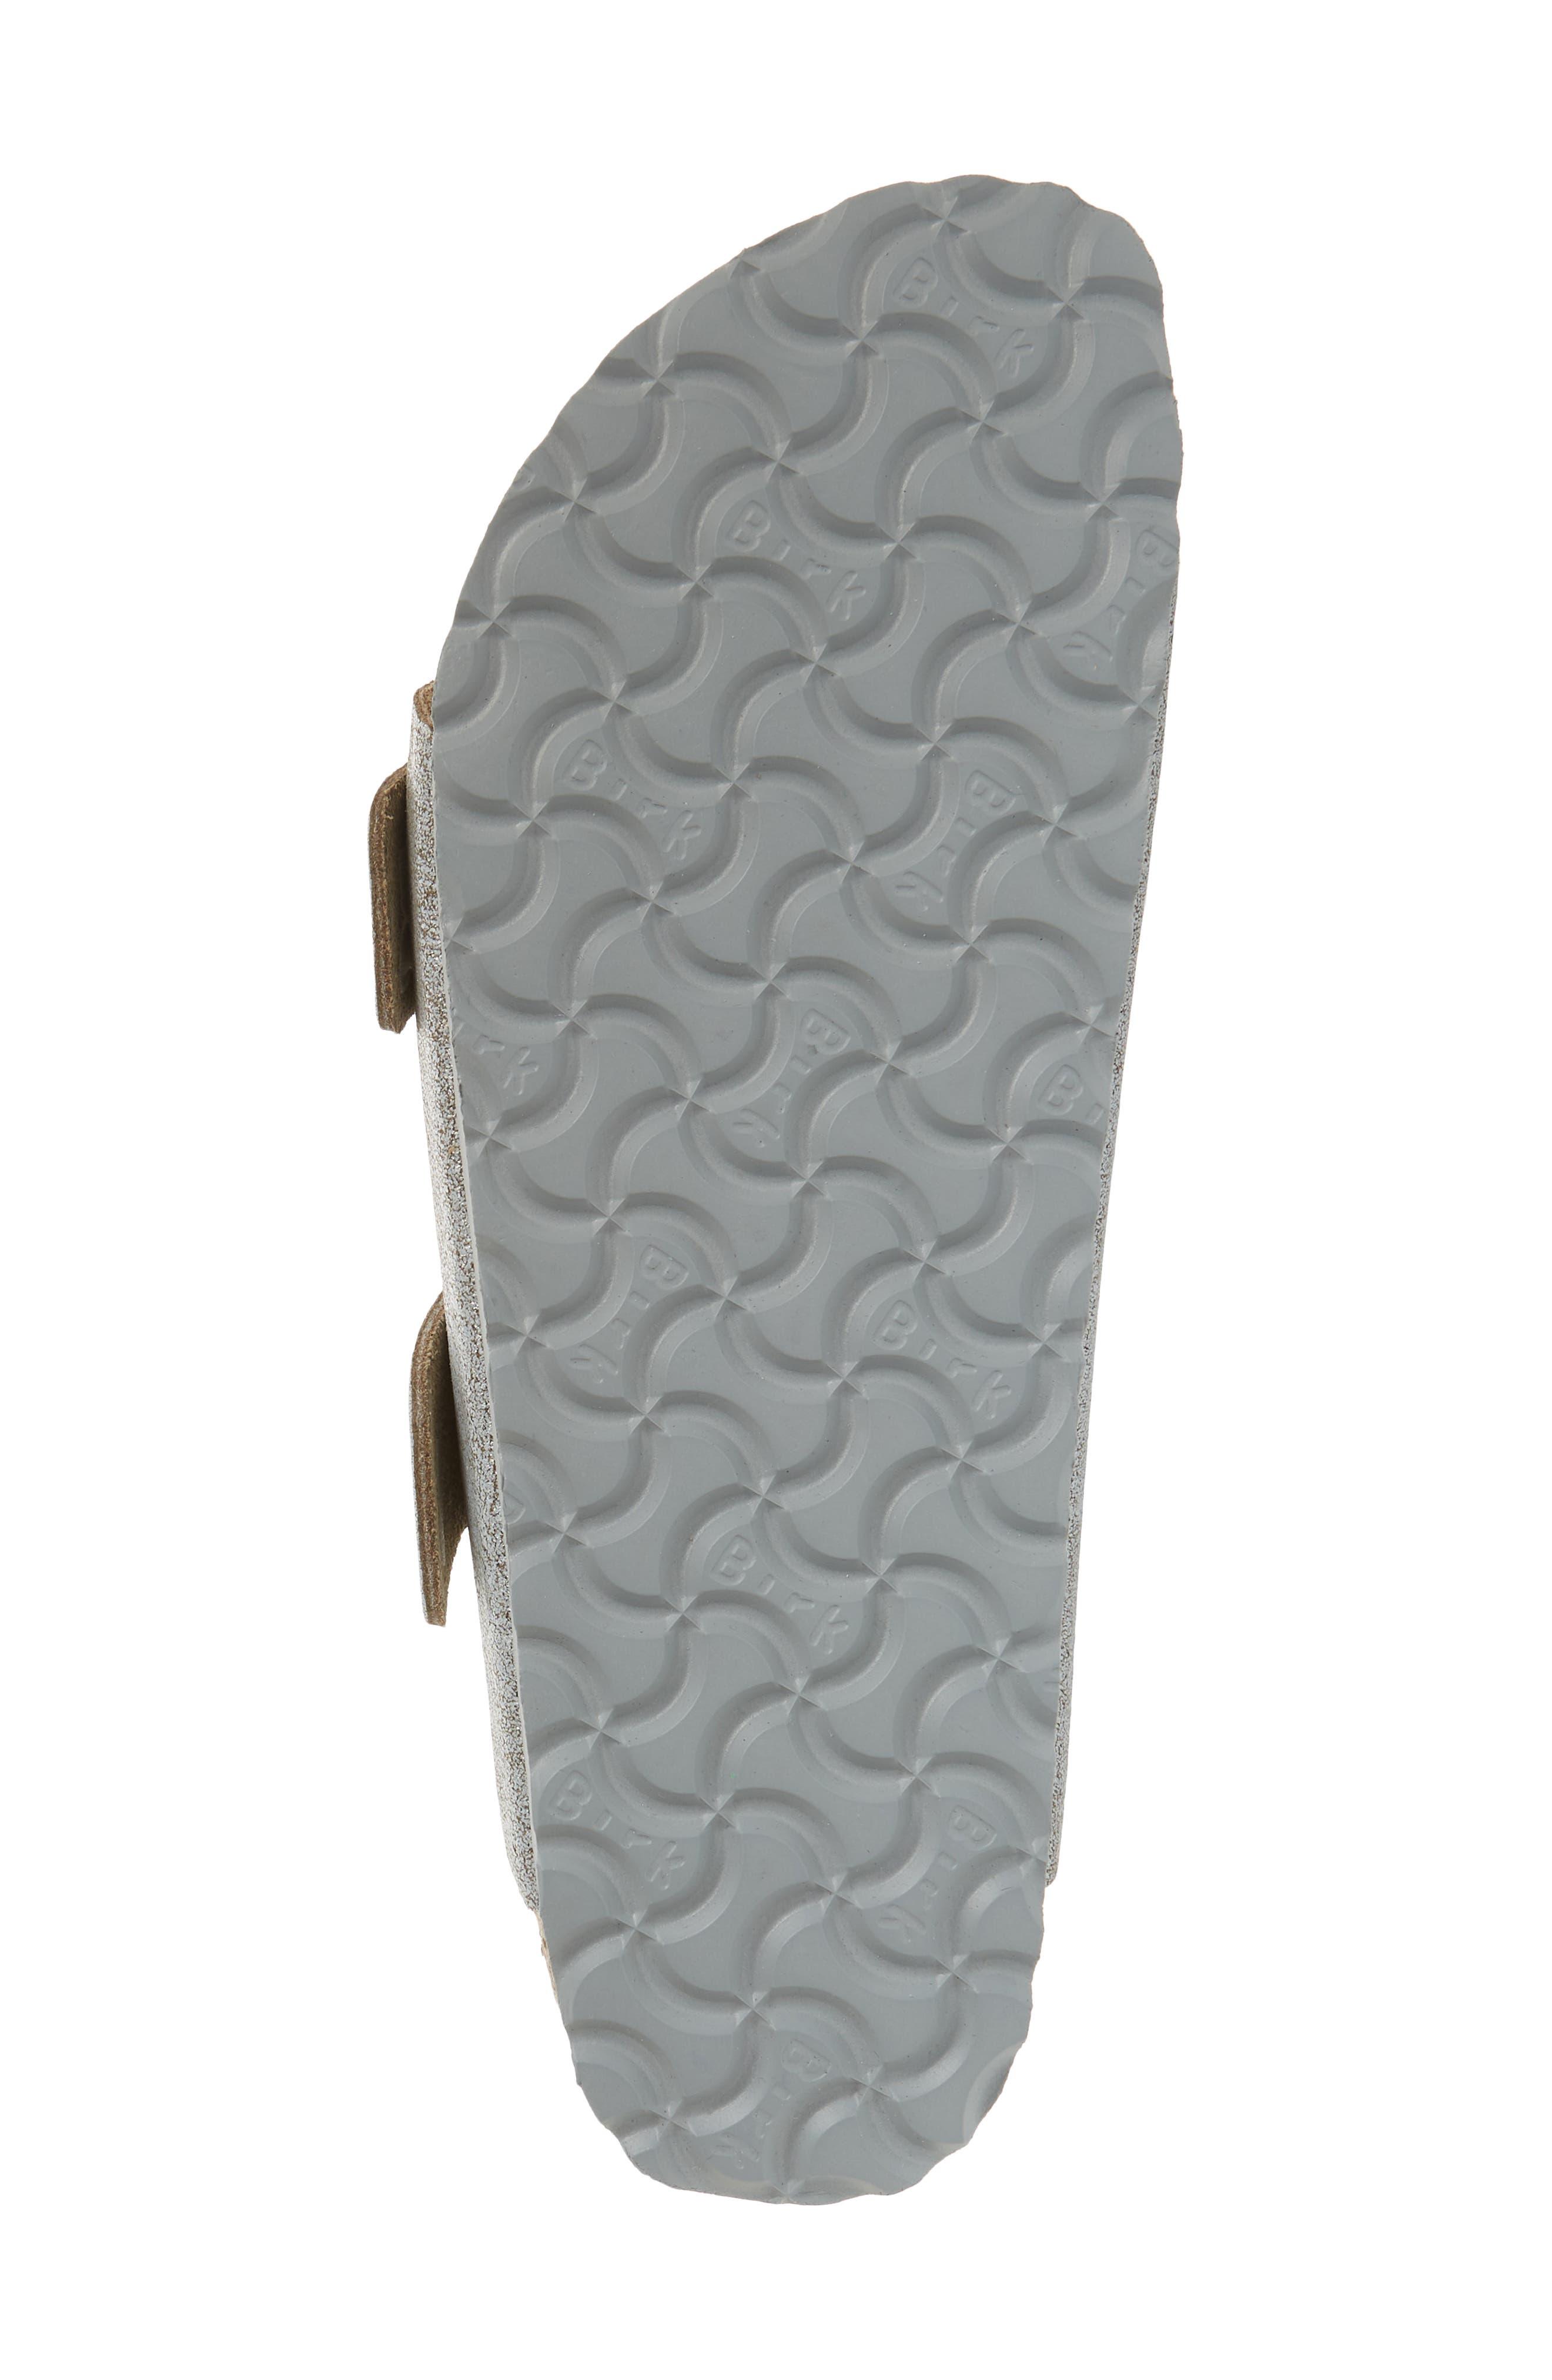 BIRKENSTOCK, Arizona Big Buckle Slide Sandal, Alternate thumbnail 6, color, WASHED METALLIC BLUE LEATHER